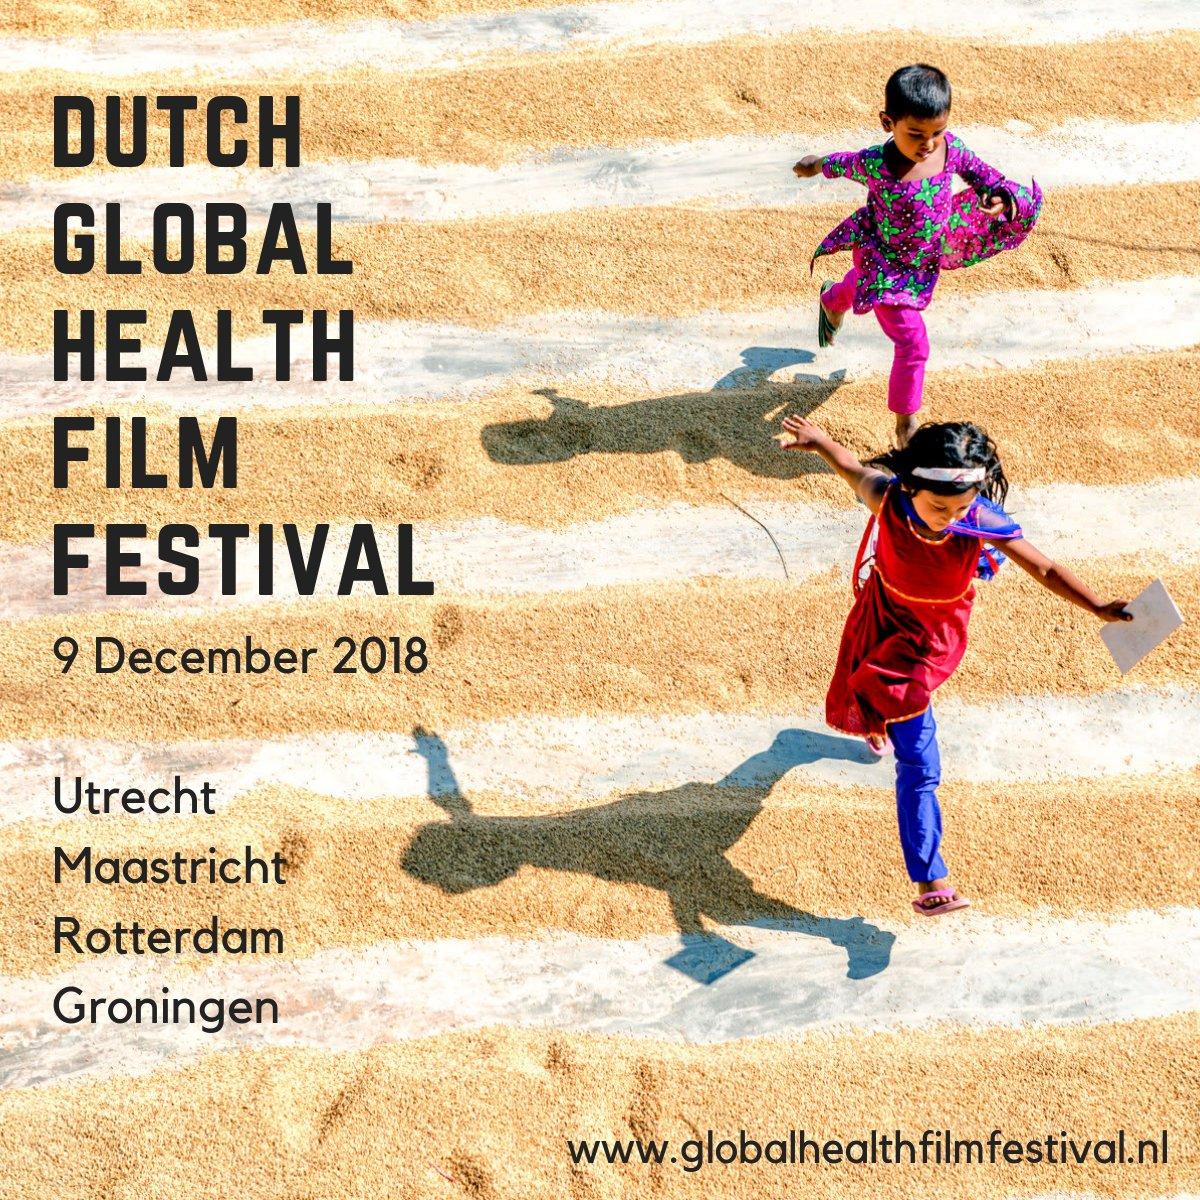 Dghff On Twitter The Dutch Global Health Film Festival Is In 2